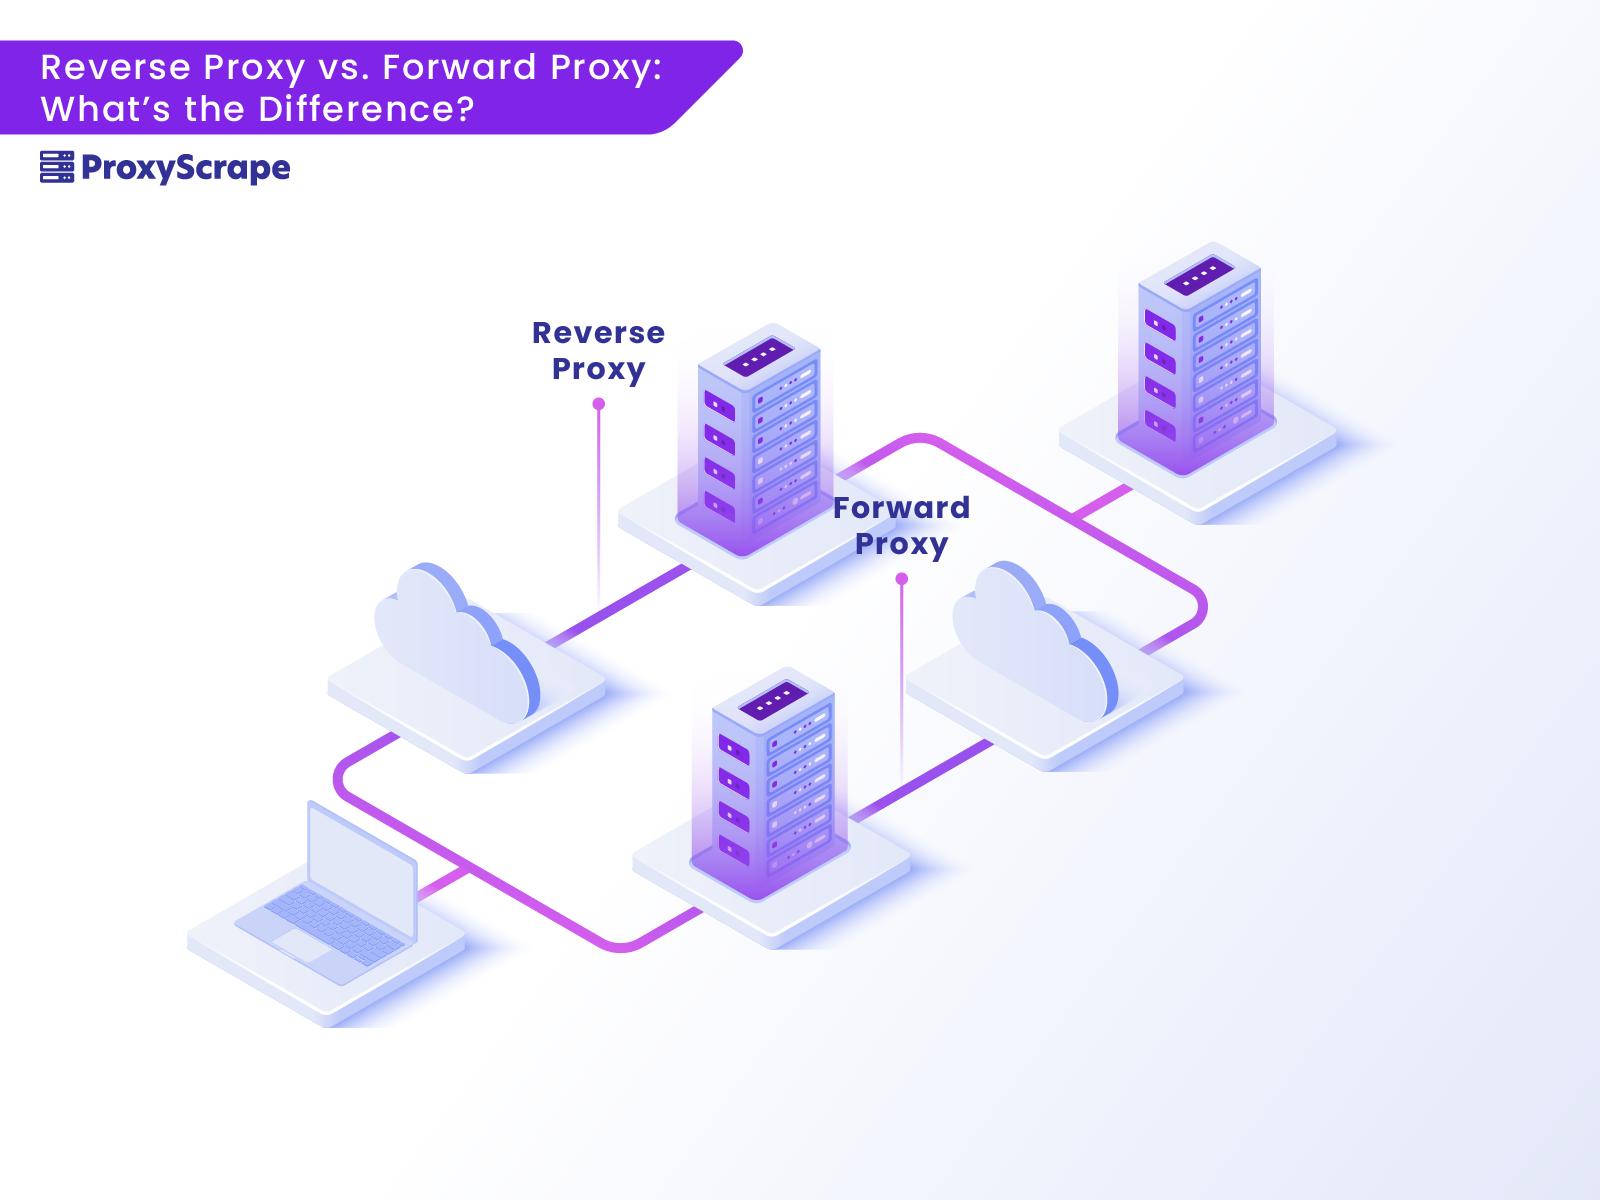 Reverse proxy vs forward proxy